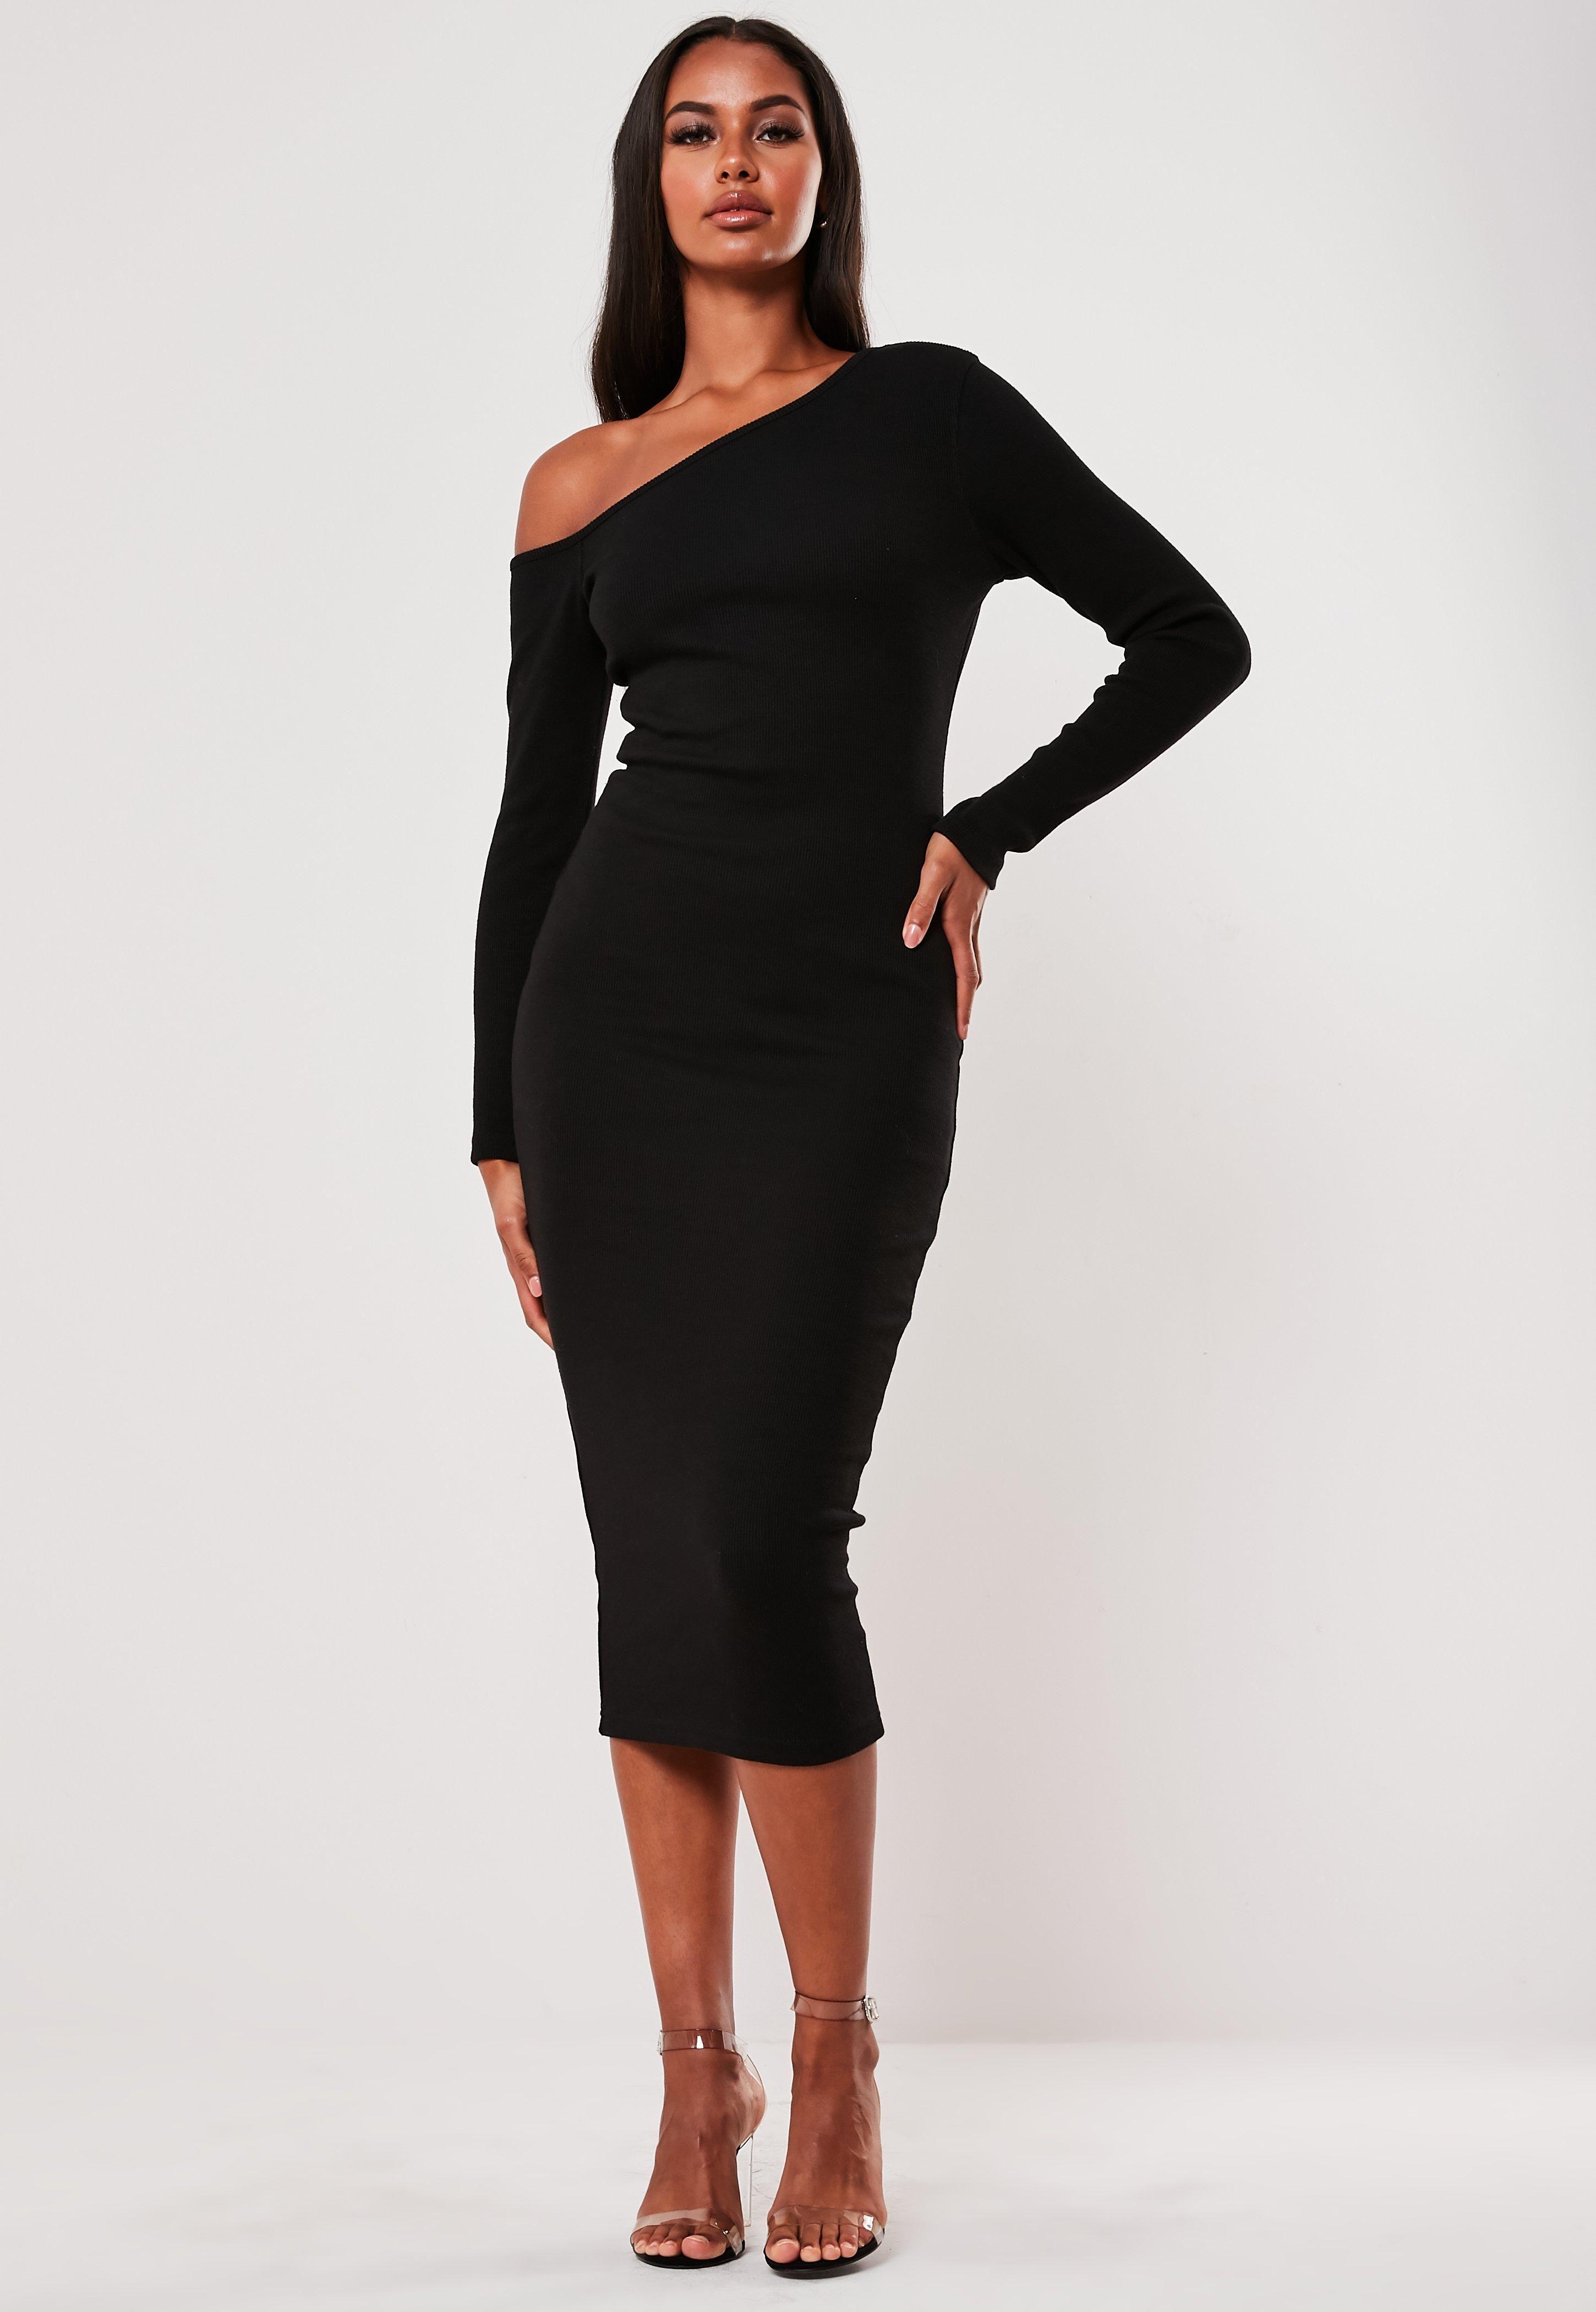 Black Rib Off Shoulder Bodycon Midi Dress Sponsored Shoulder Spon Rib Black Midi Dress Bodycon Women Dress Online Trending Dresses [ 4200 x 2900 Pixel ]